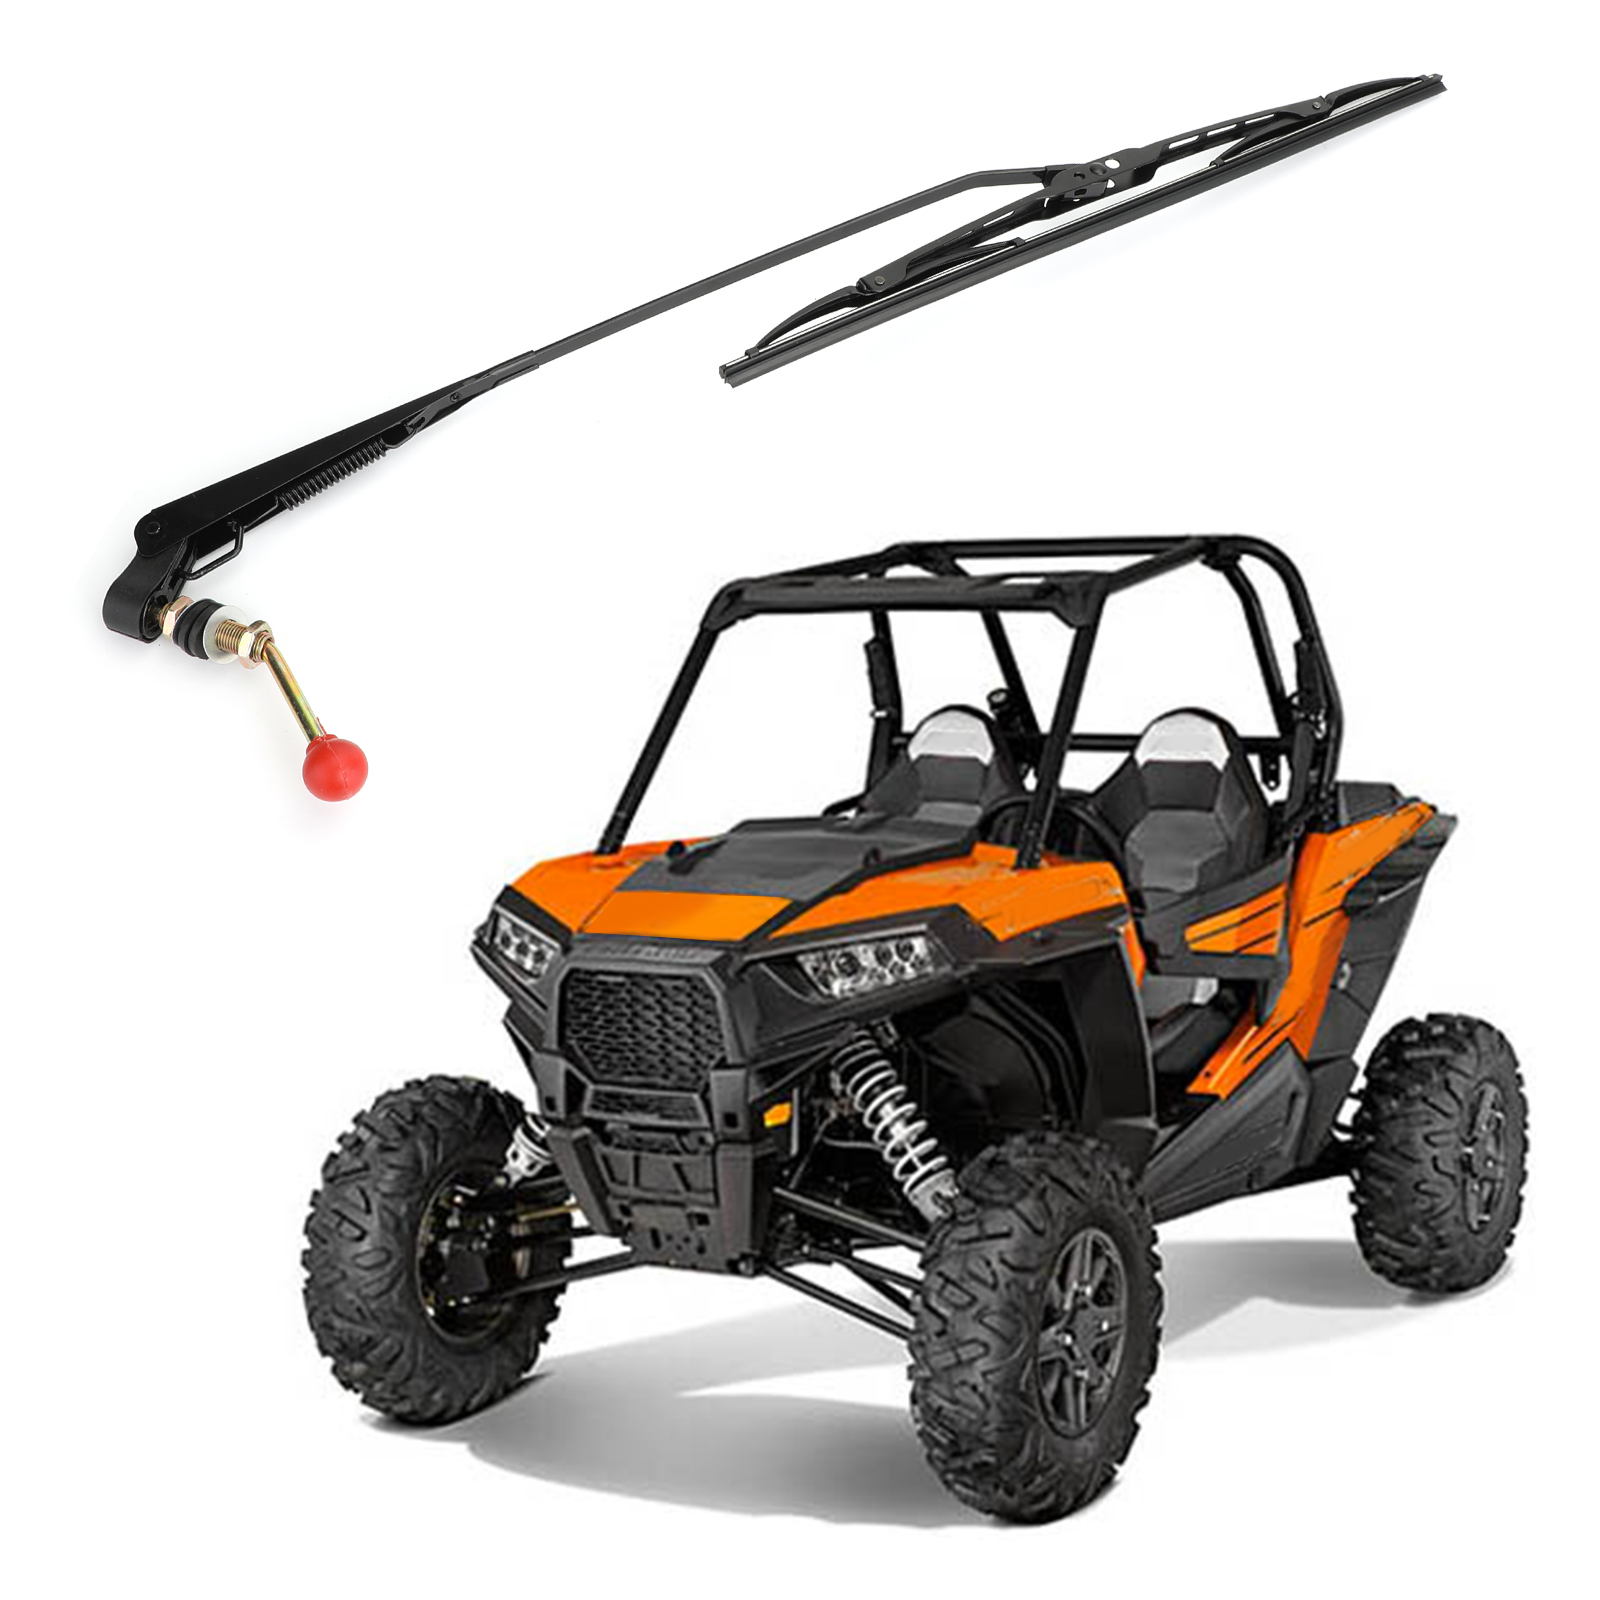 Trigger Accessory Control System for UTV Side x Side Ranger RZR Maverick Teryx